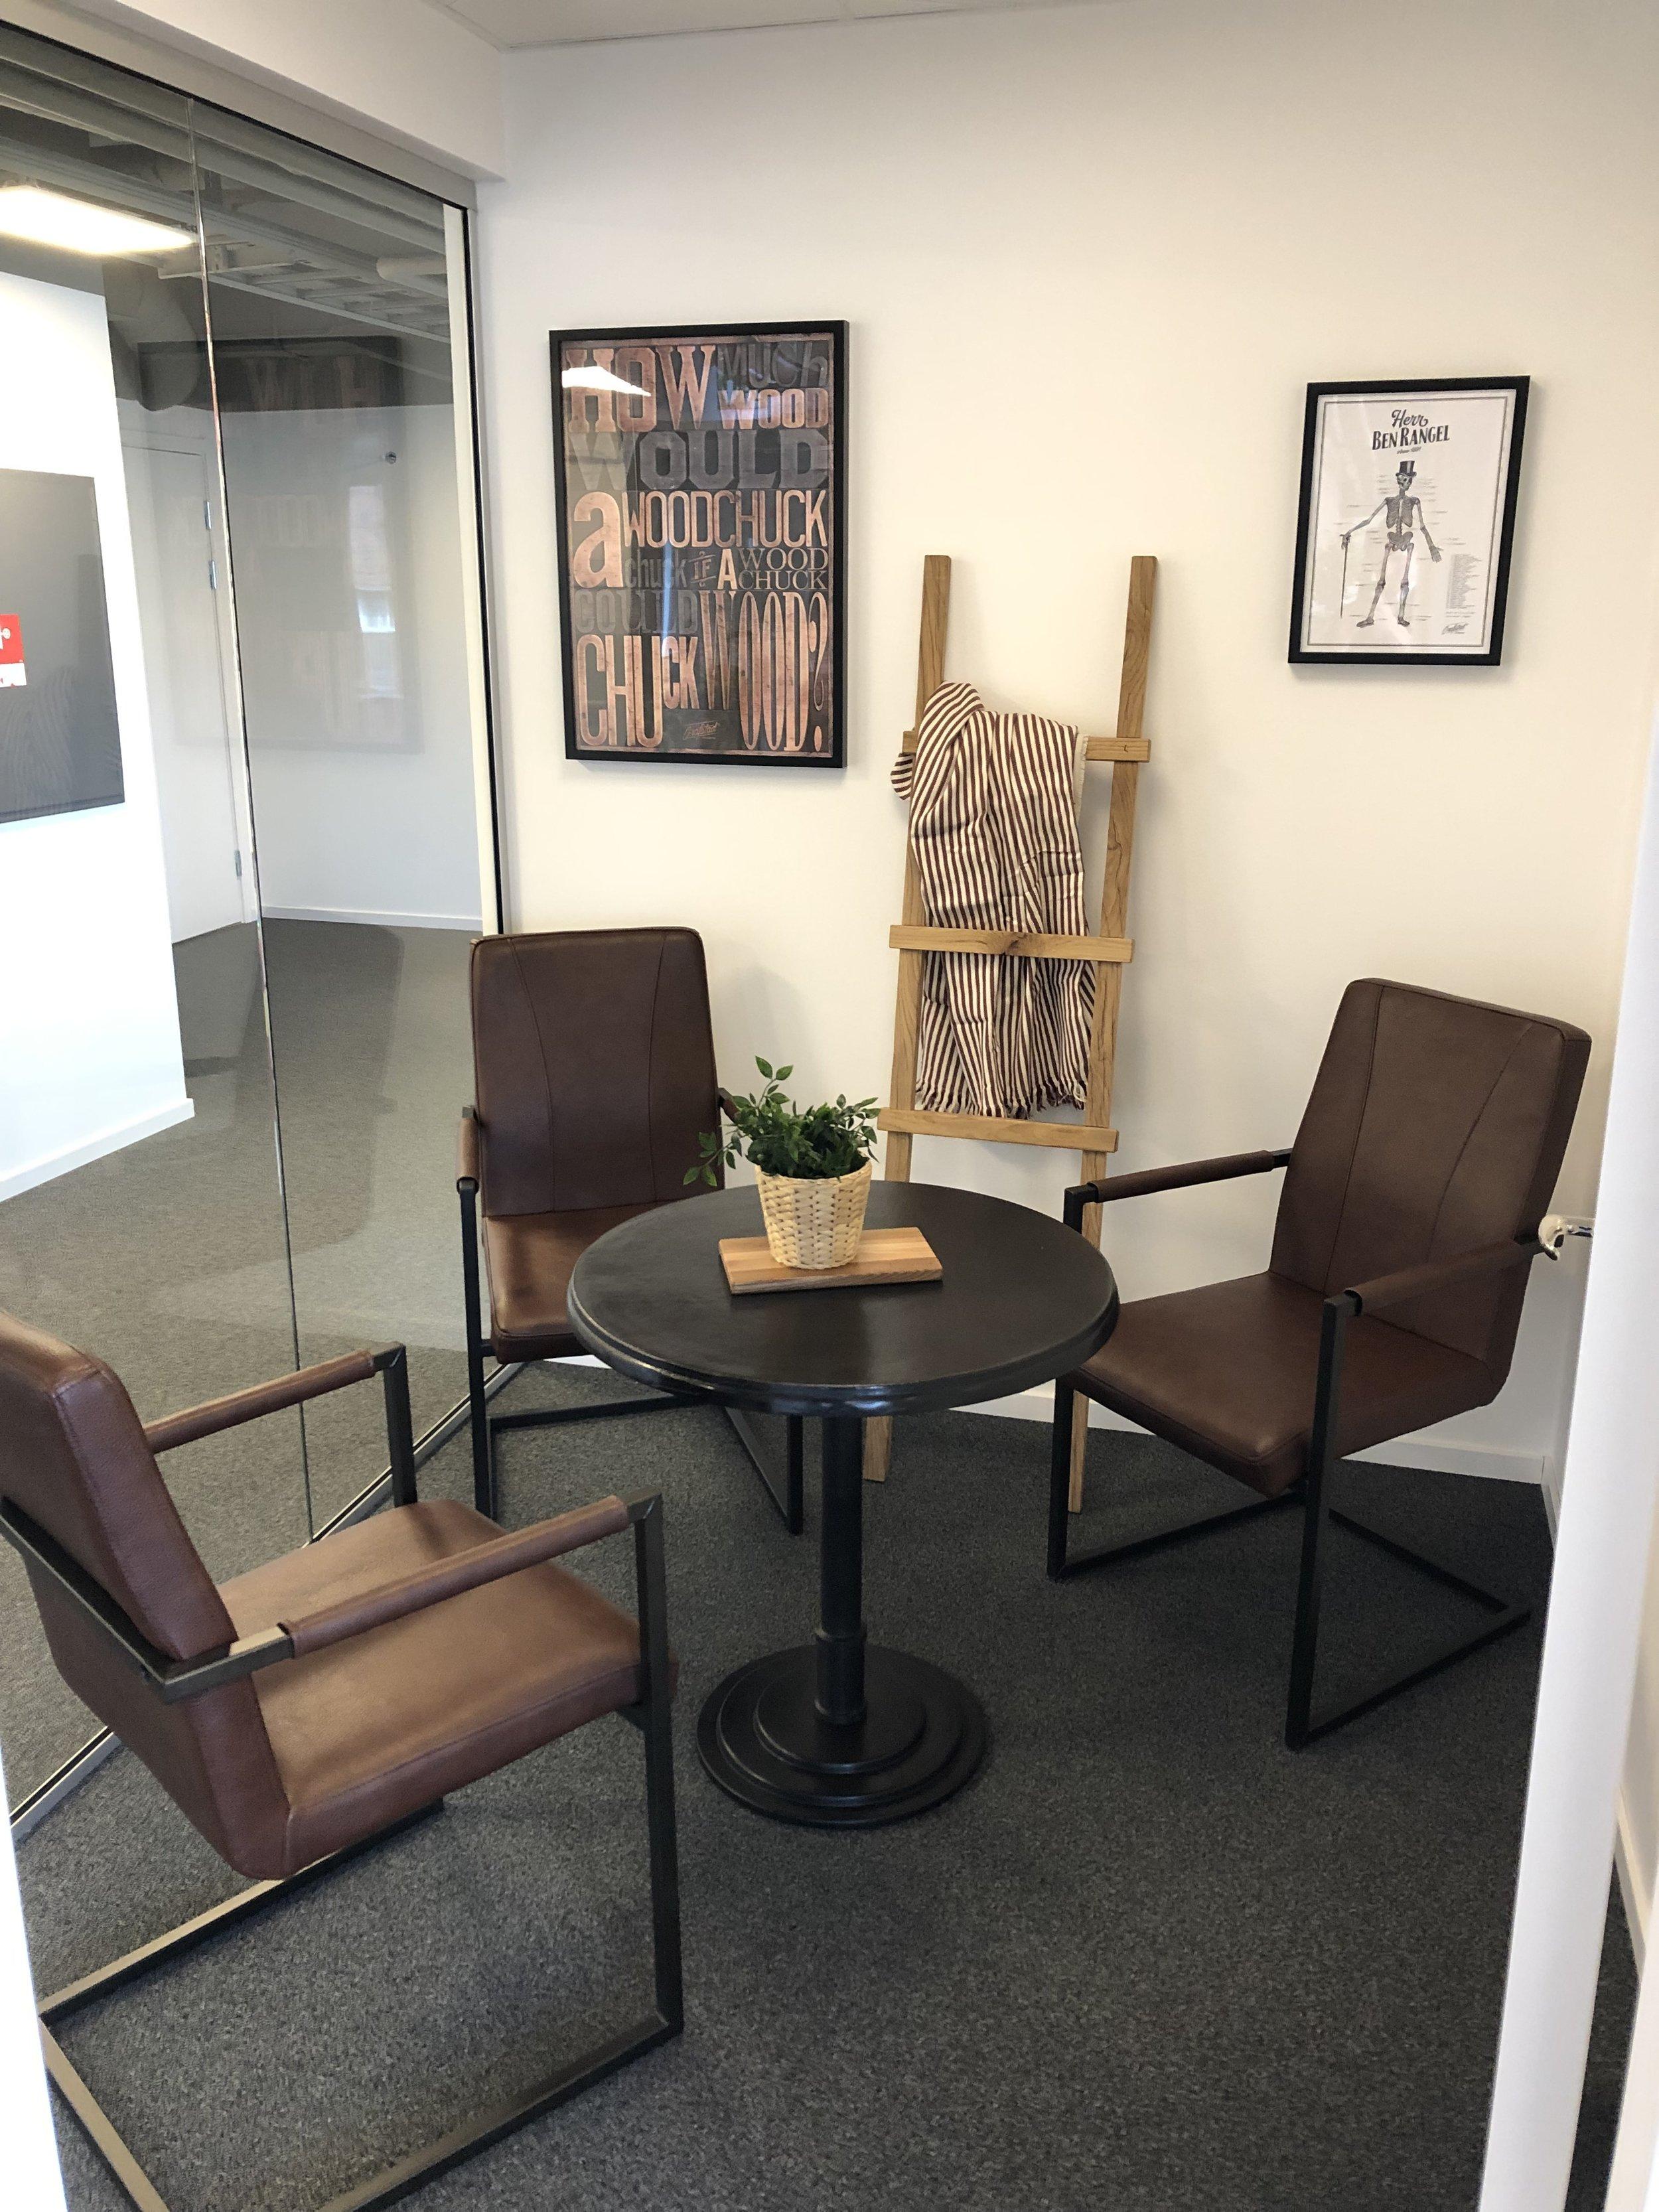 Inredningsstege i rustik ek på kontor - Linköping